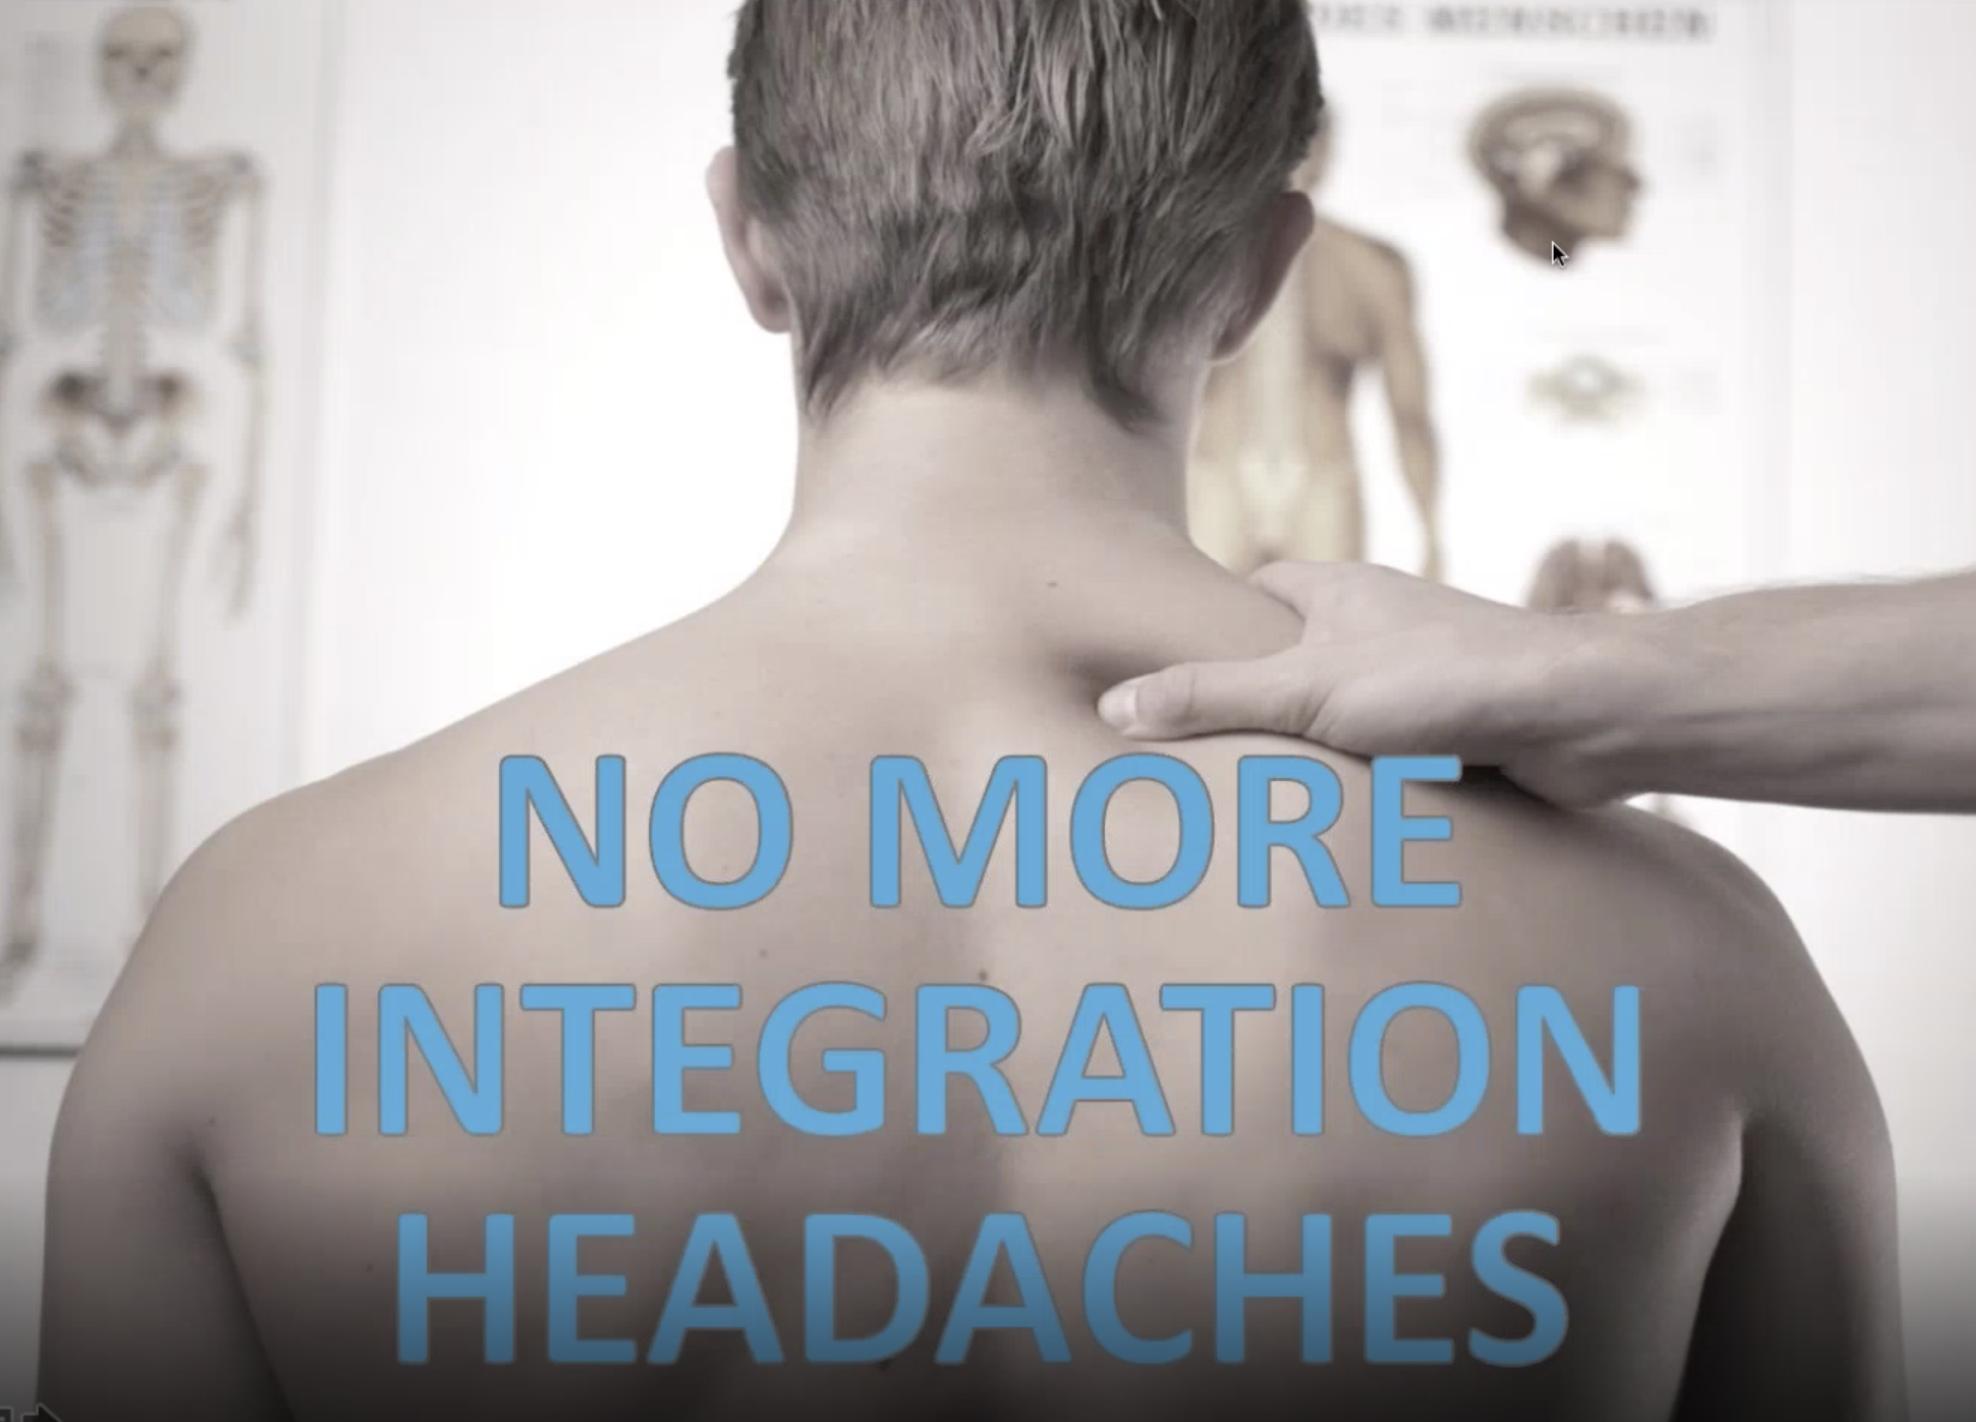 No more integration headaches